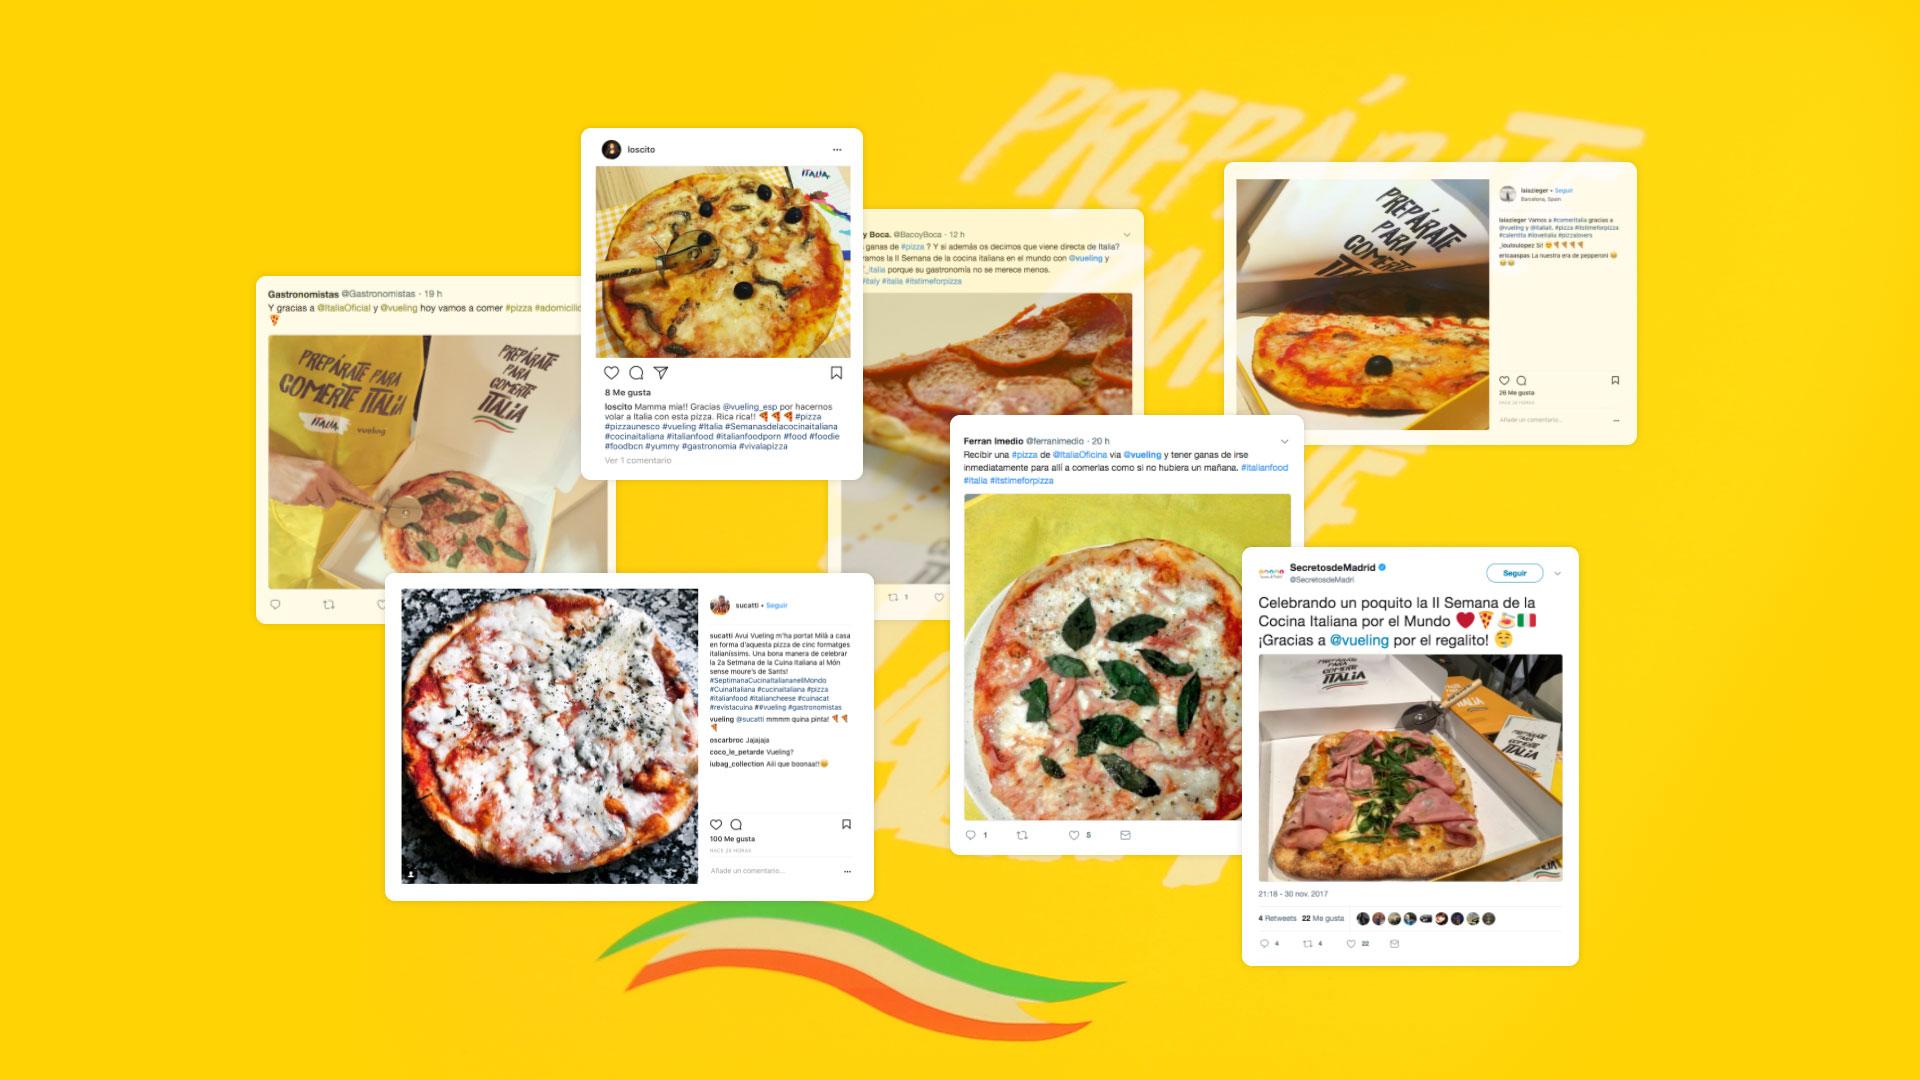 Vueling We Love Pizza RRSS